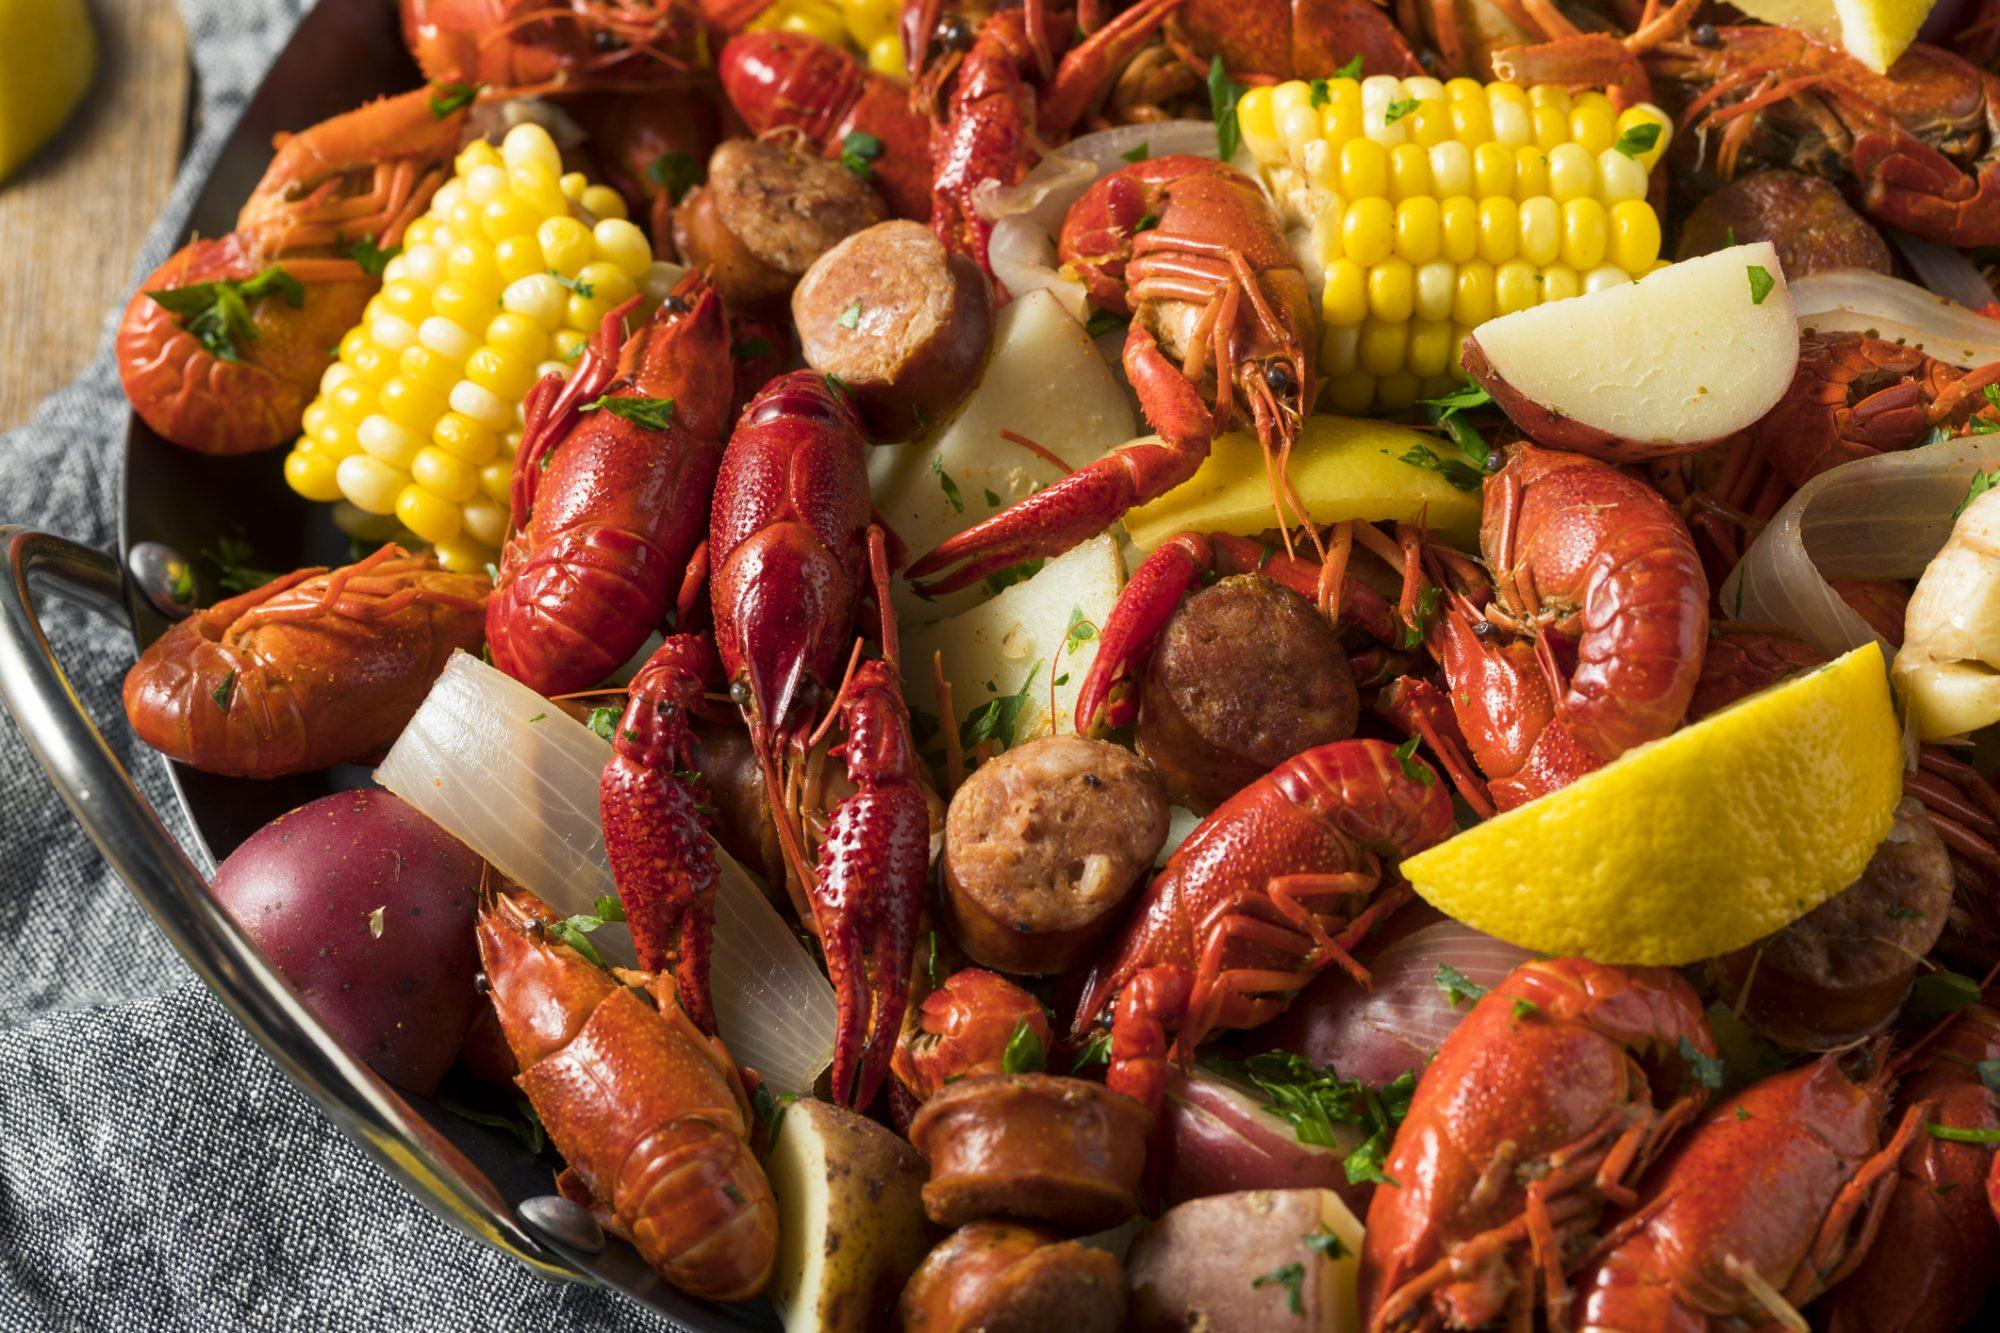 6 Ways to Use Cajun Seasoning That Aren't Gumbo